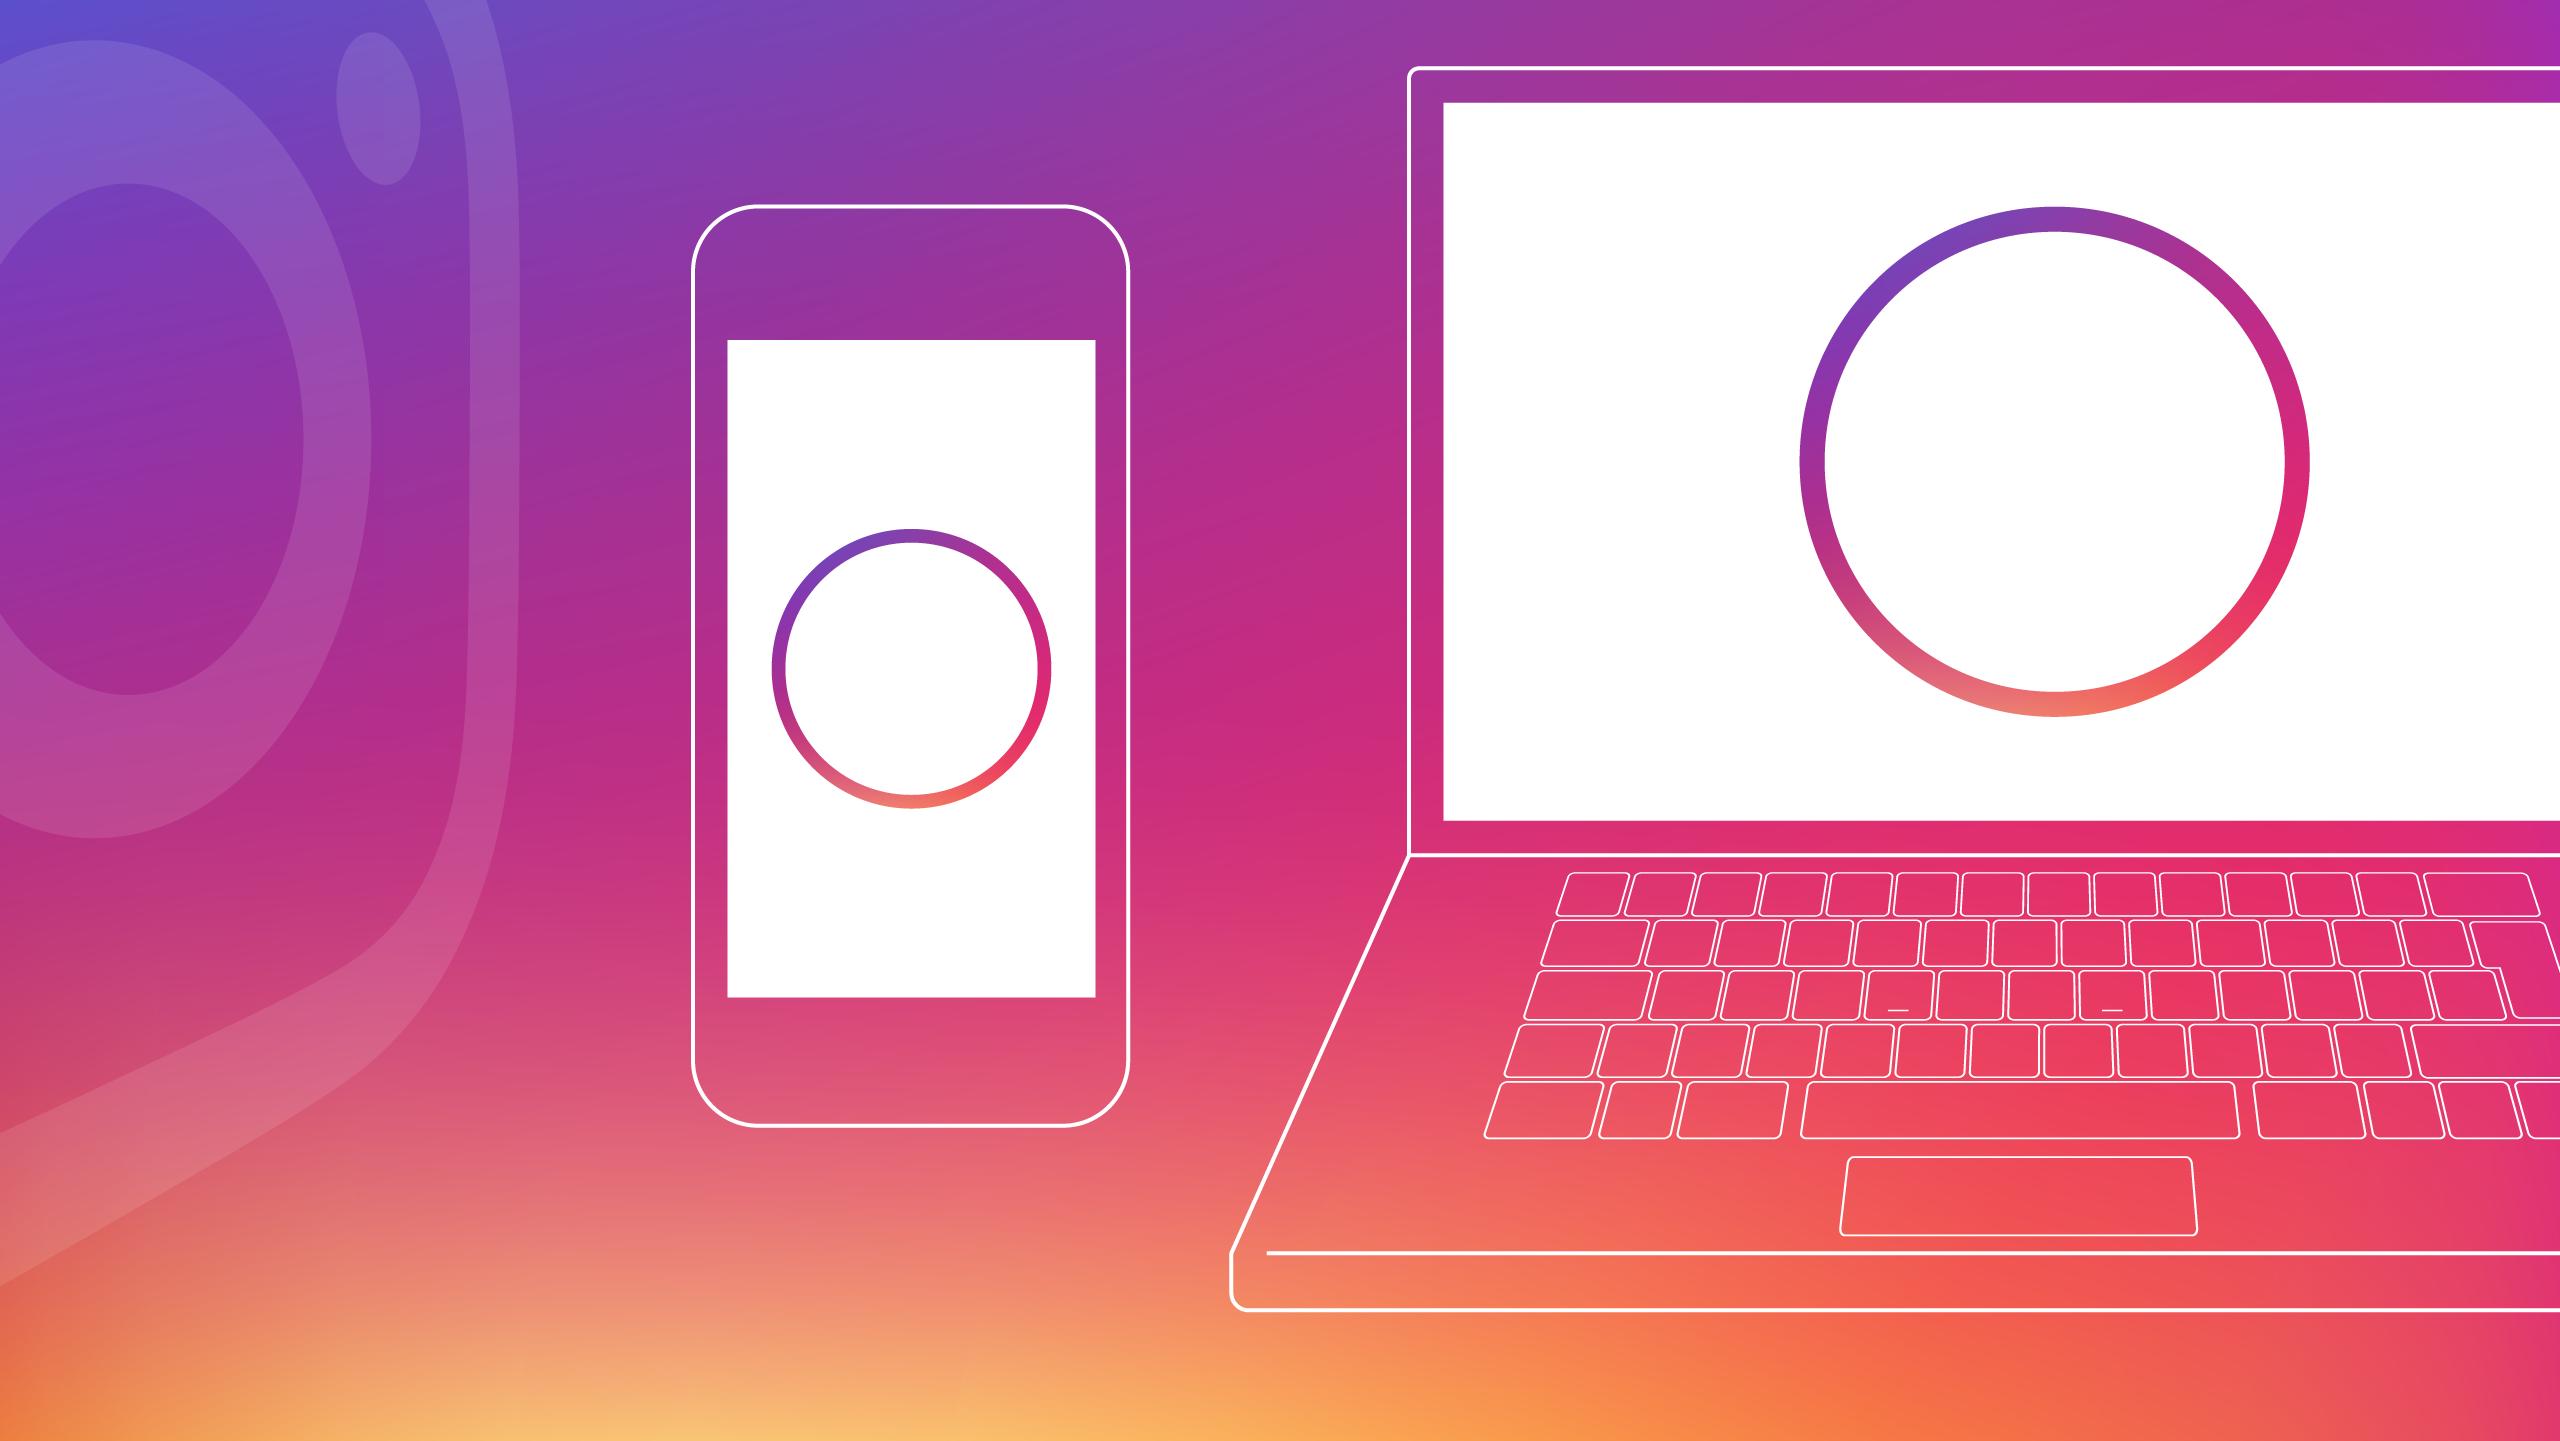 Storie animate su Instagram: 7 App per crearle al meglio